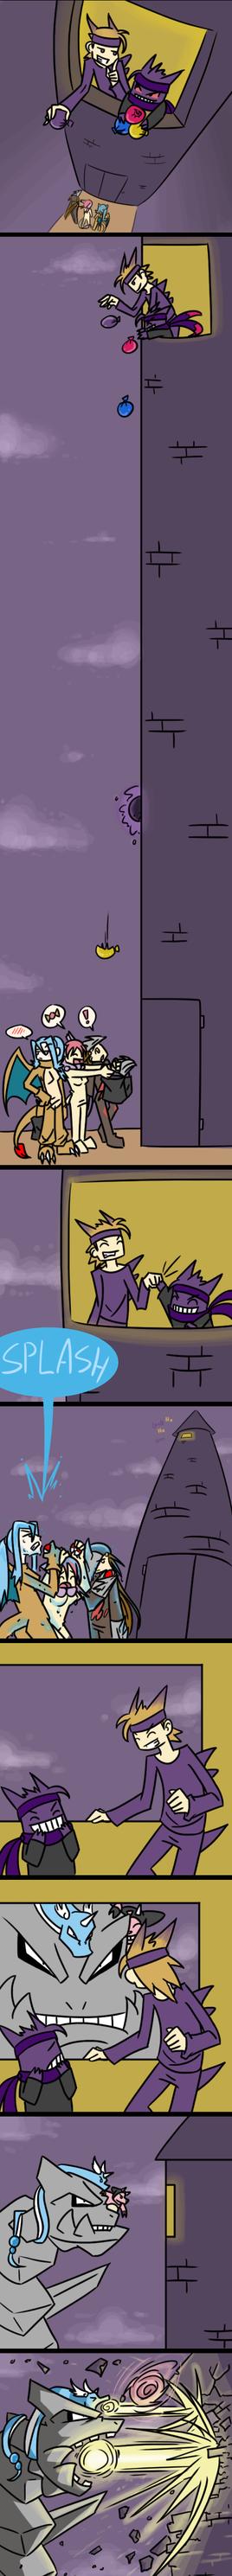 Morty's Hell-o Tricks by DrawFag159381